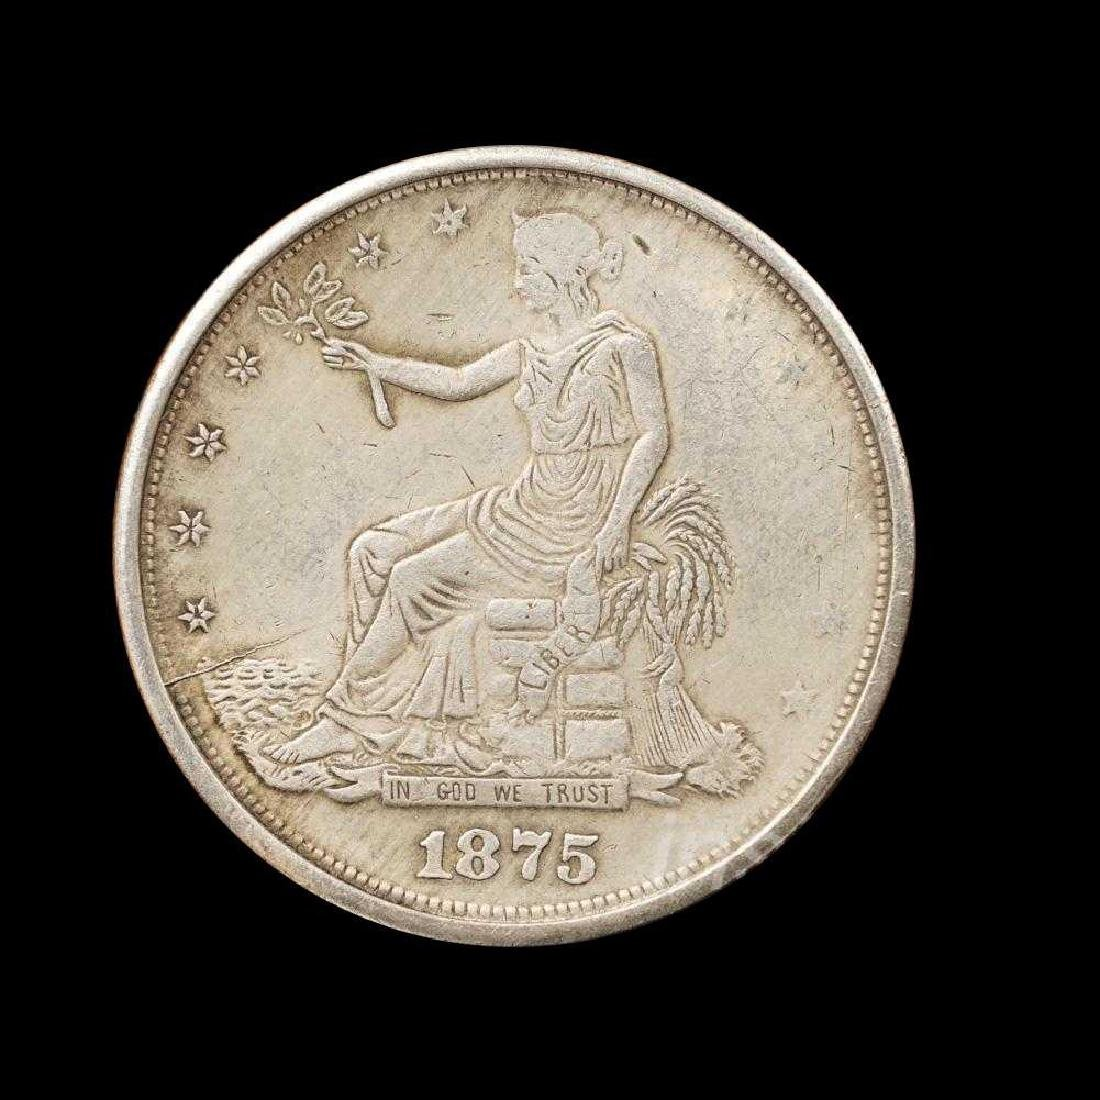 1875 United States Trade Dollar Commemorative Coin - 6